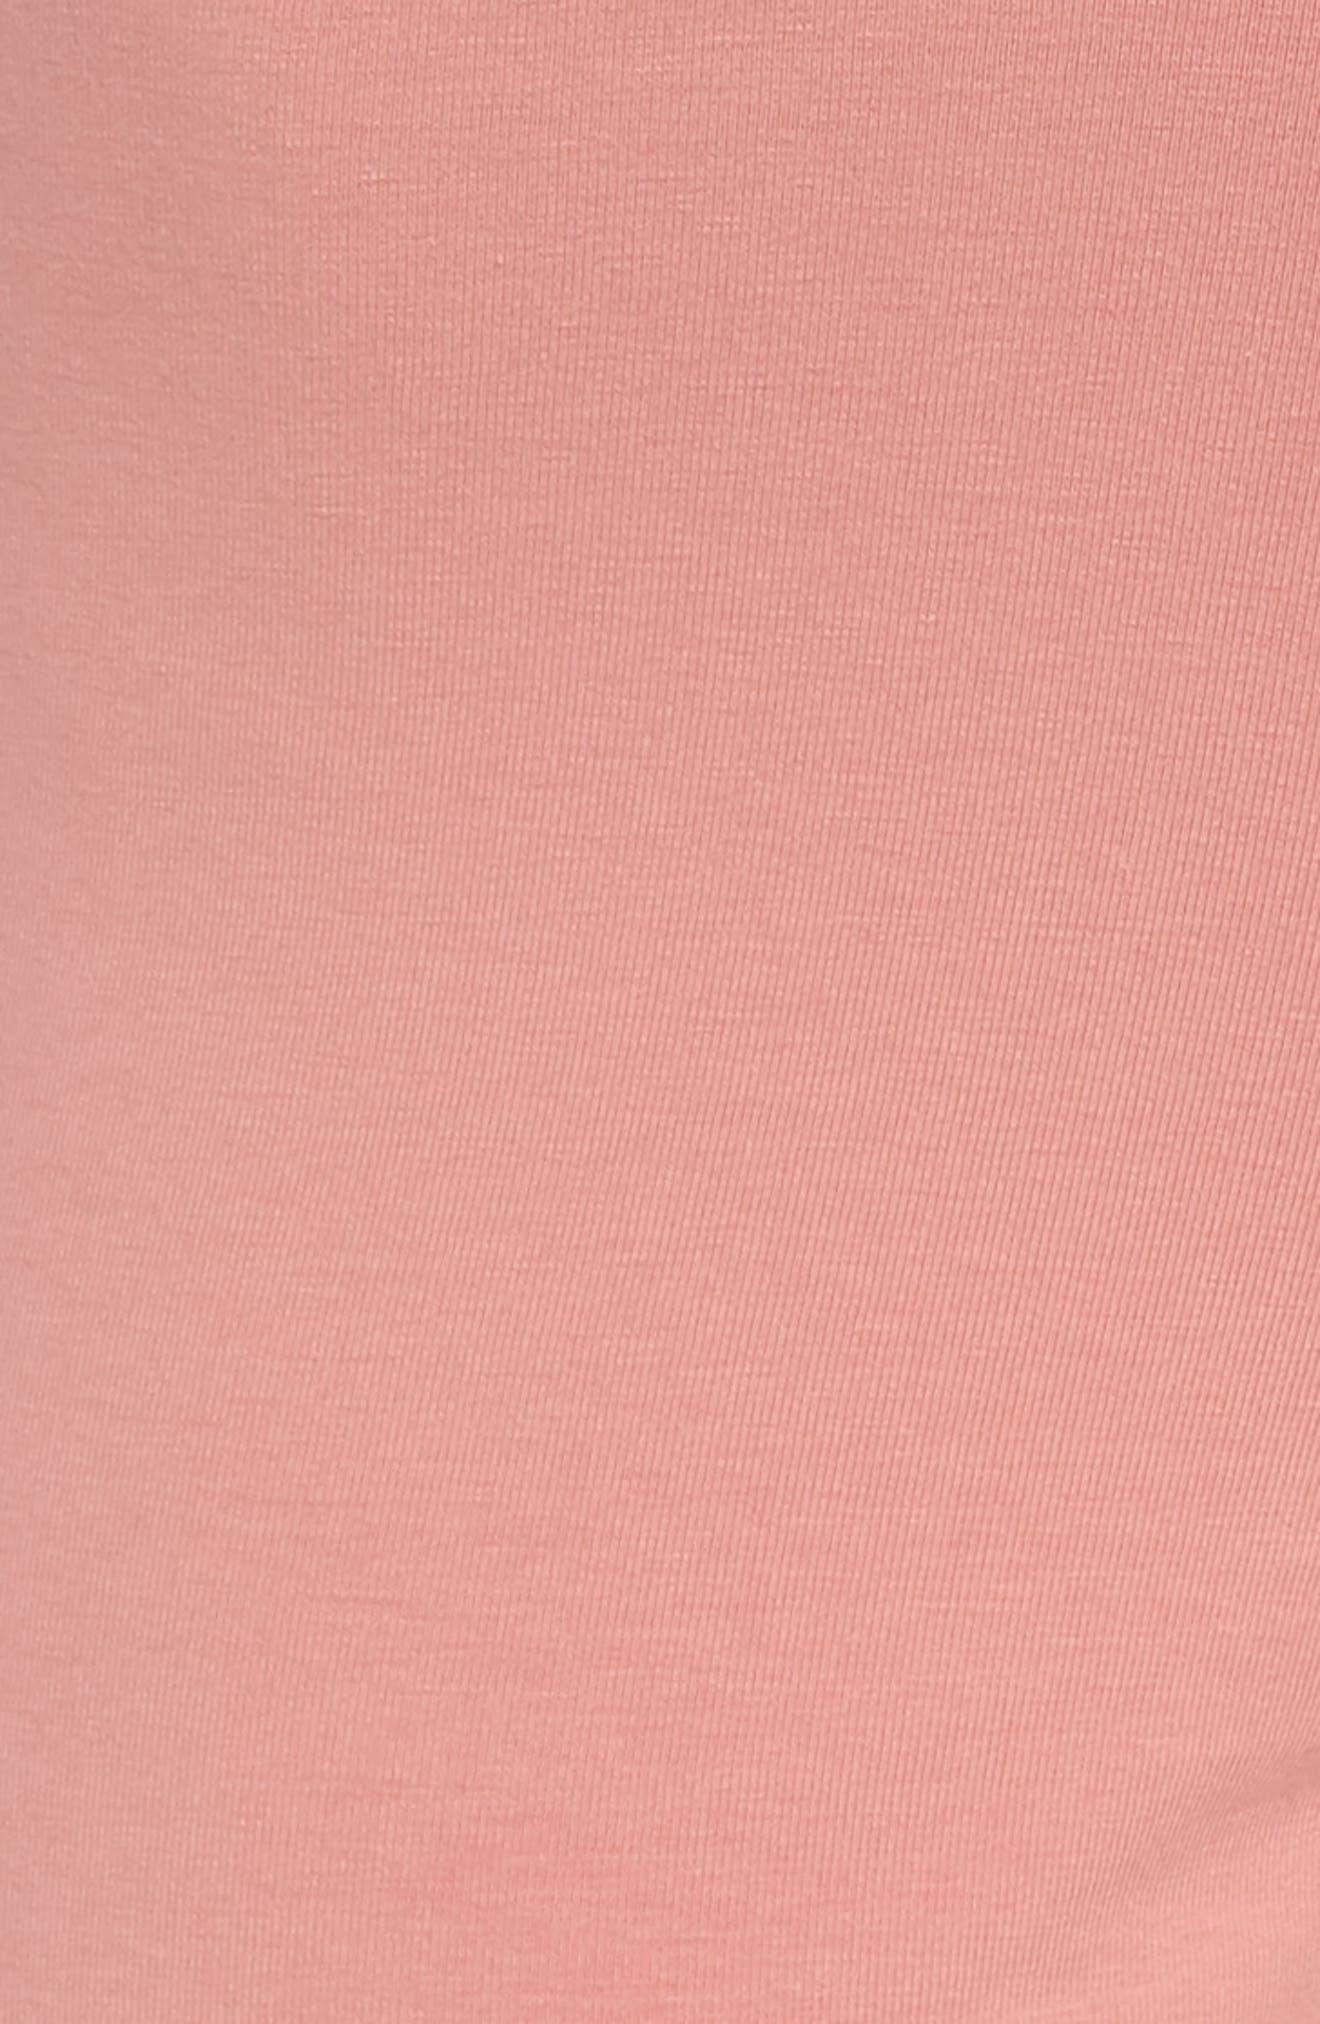 ,                             adidas 3-Stripes Tights,                             Alternate thumbnail 54, color,                             650